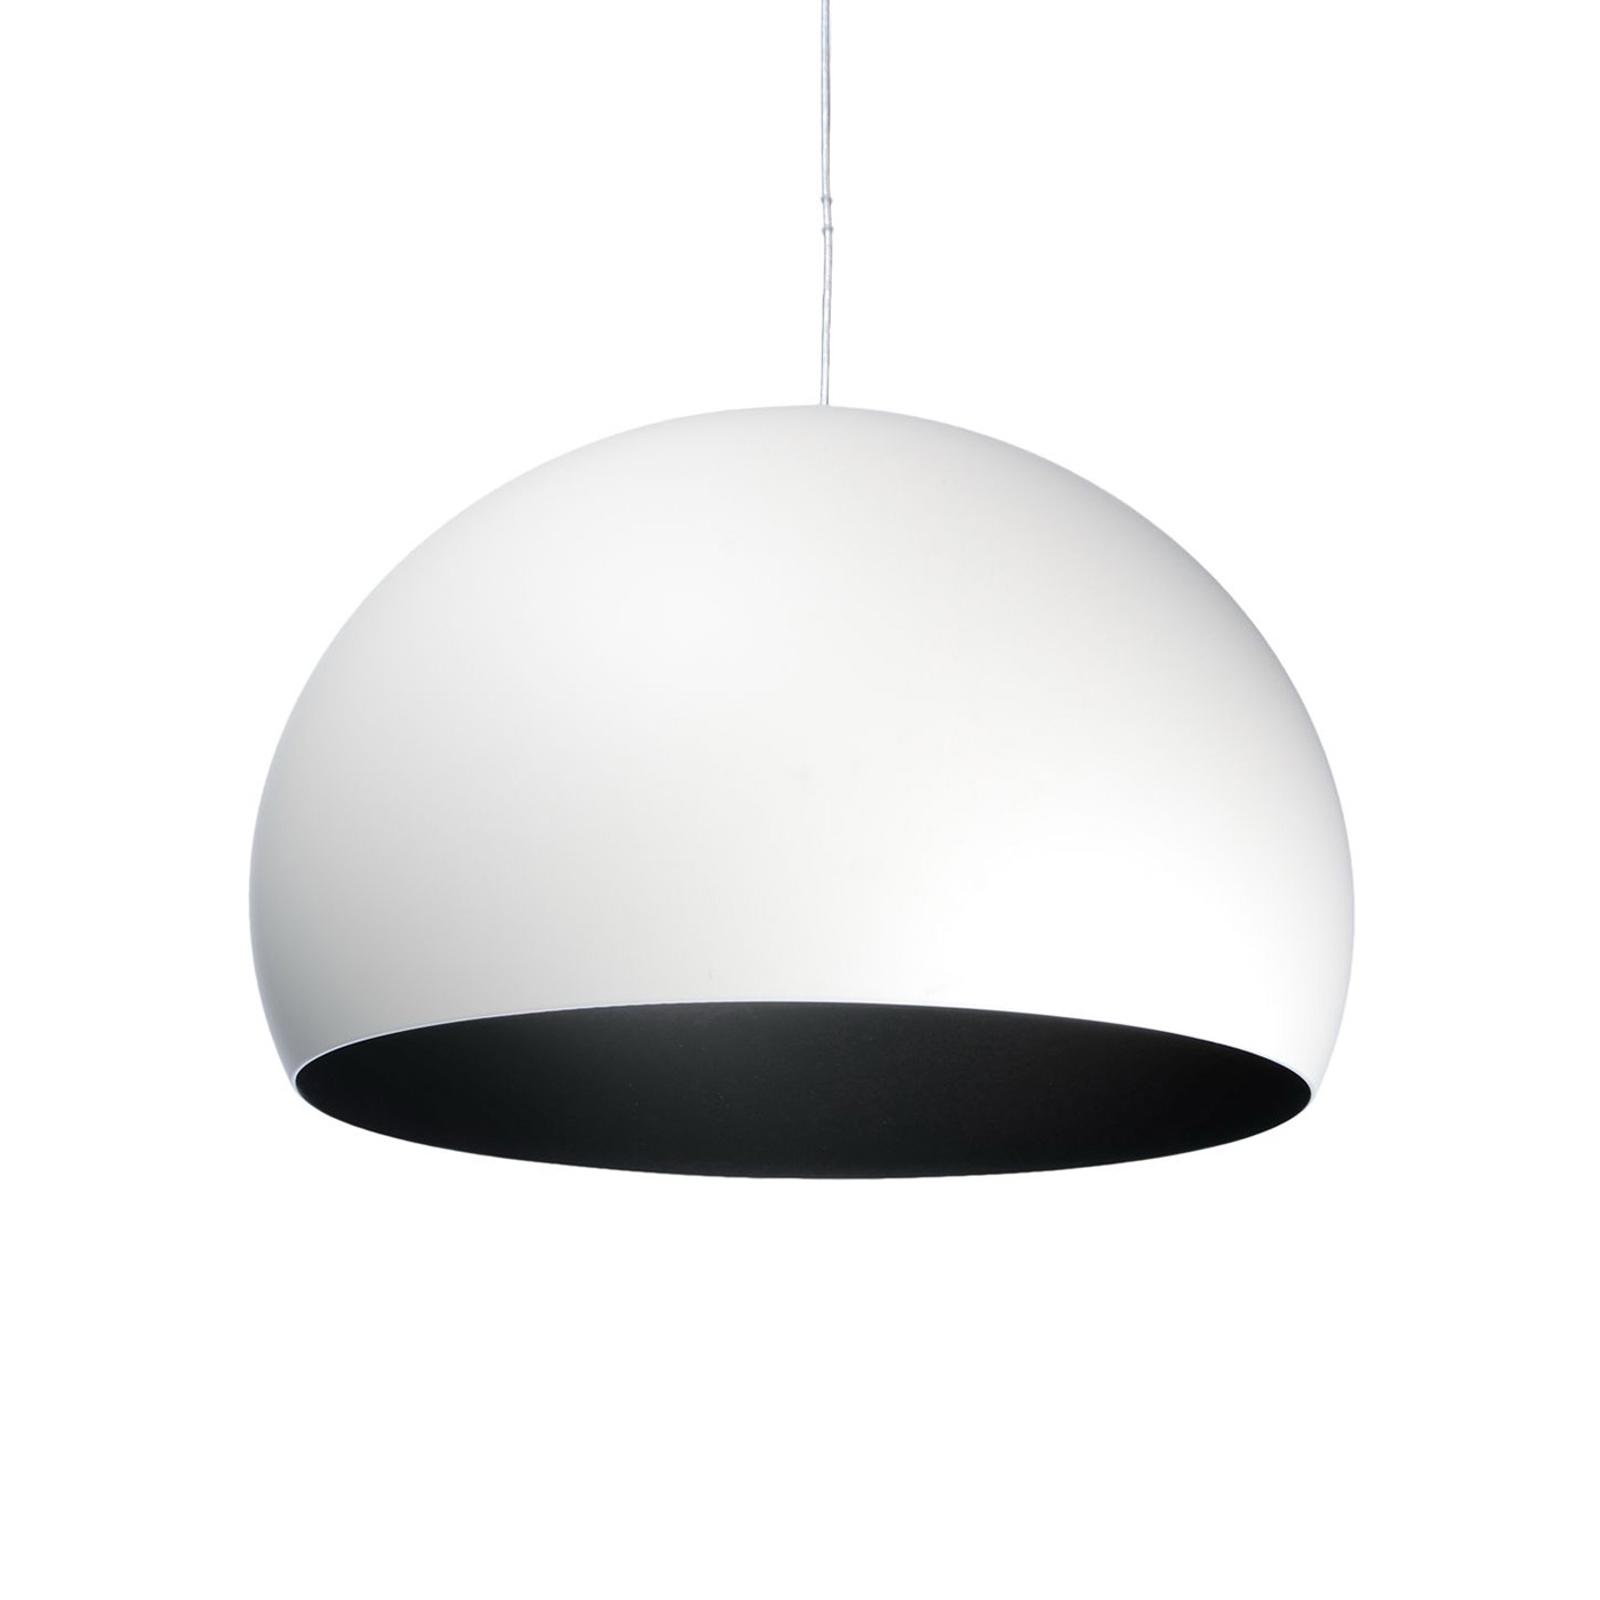 Kartell FL/Y - LED-Pendellampe, weiß matt